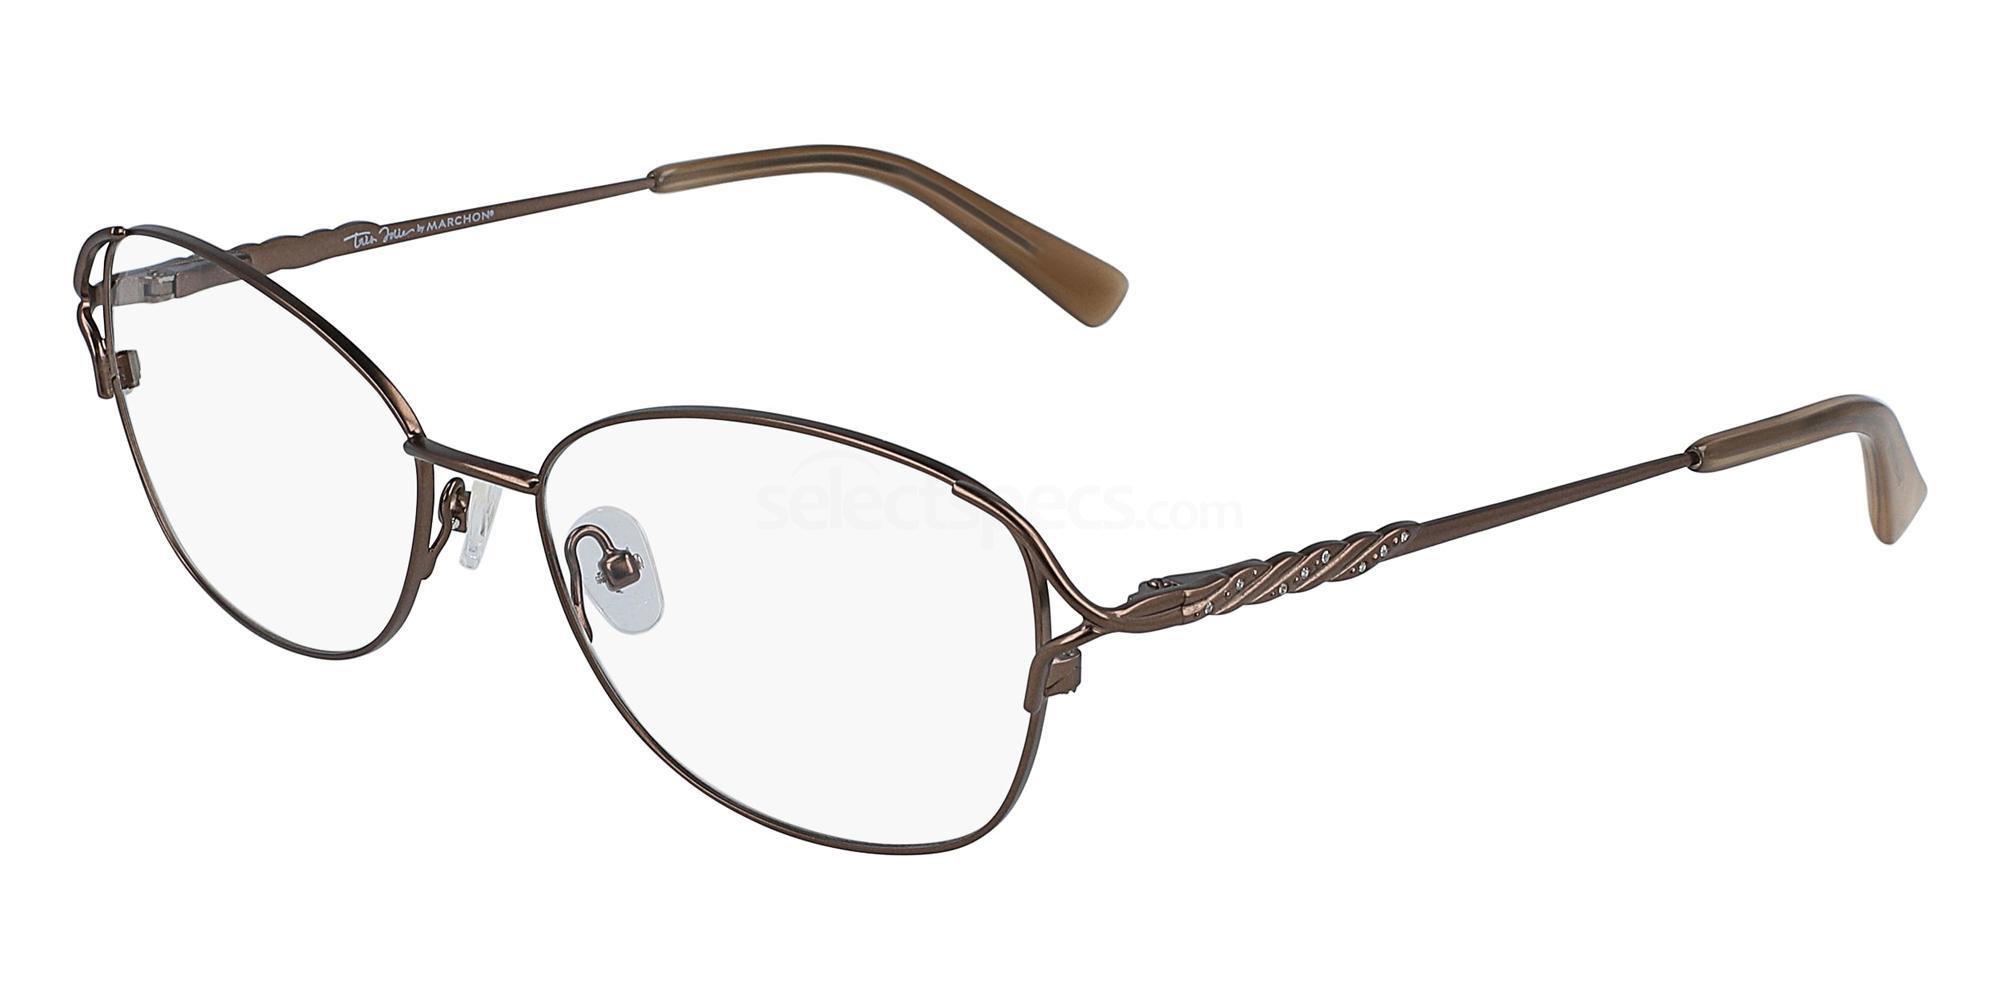 210 TRES JOLIE 187 Glasses, Tres Jolie